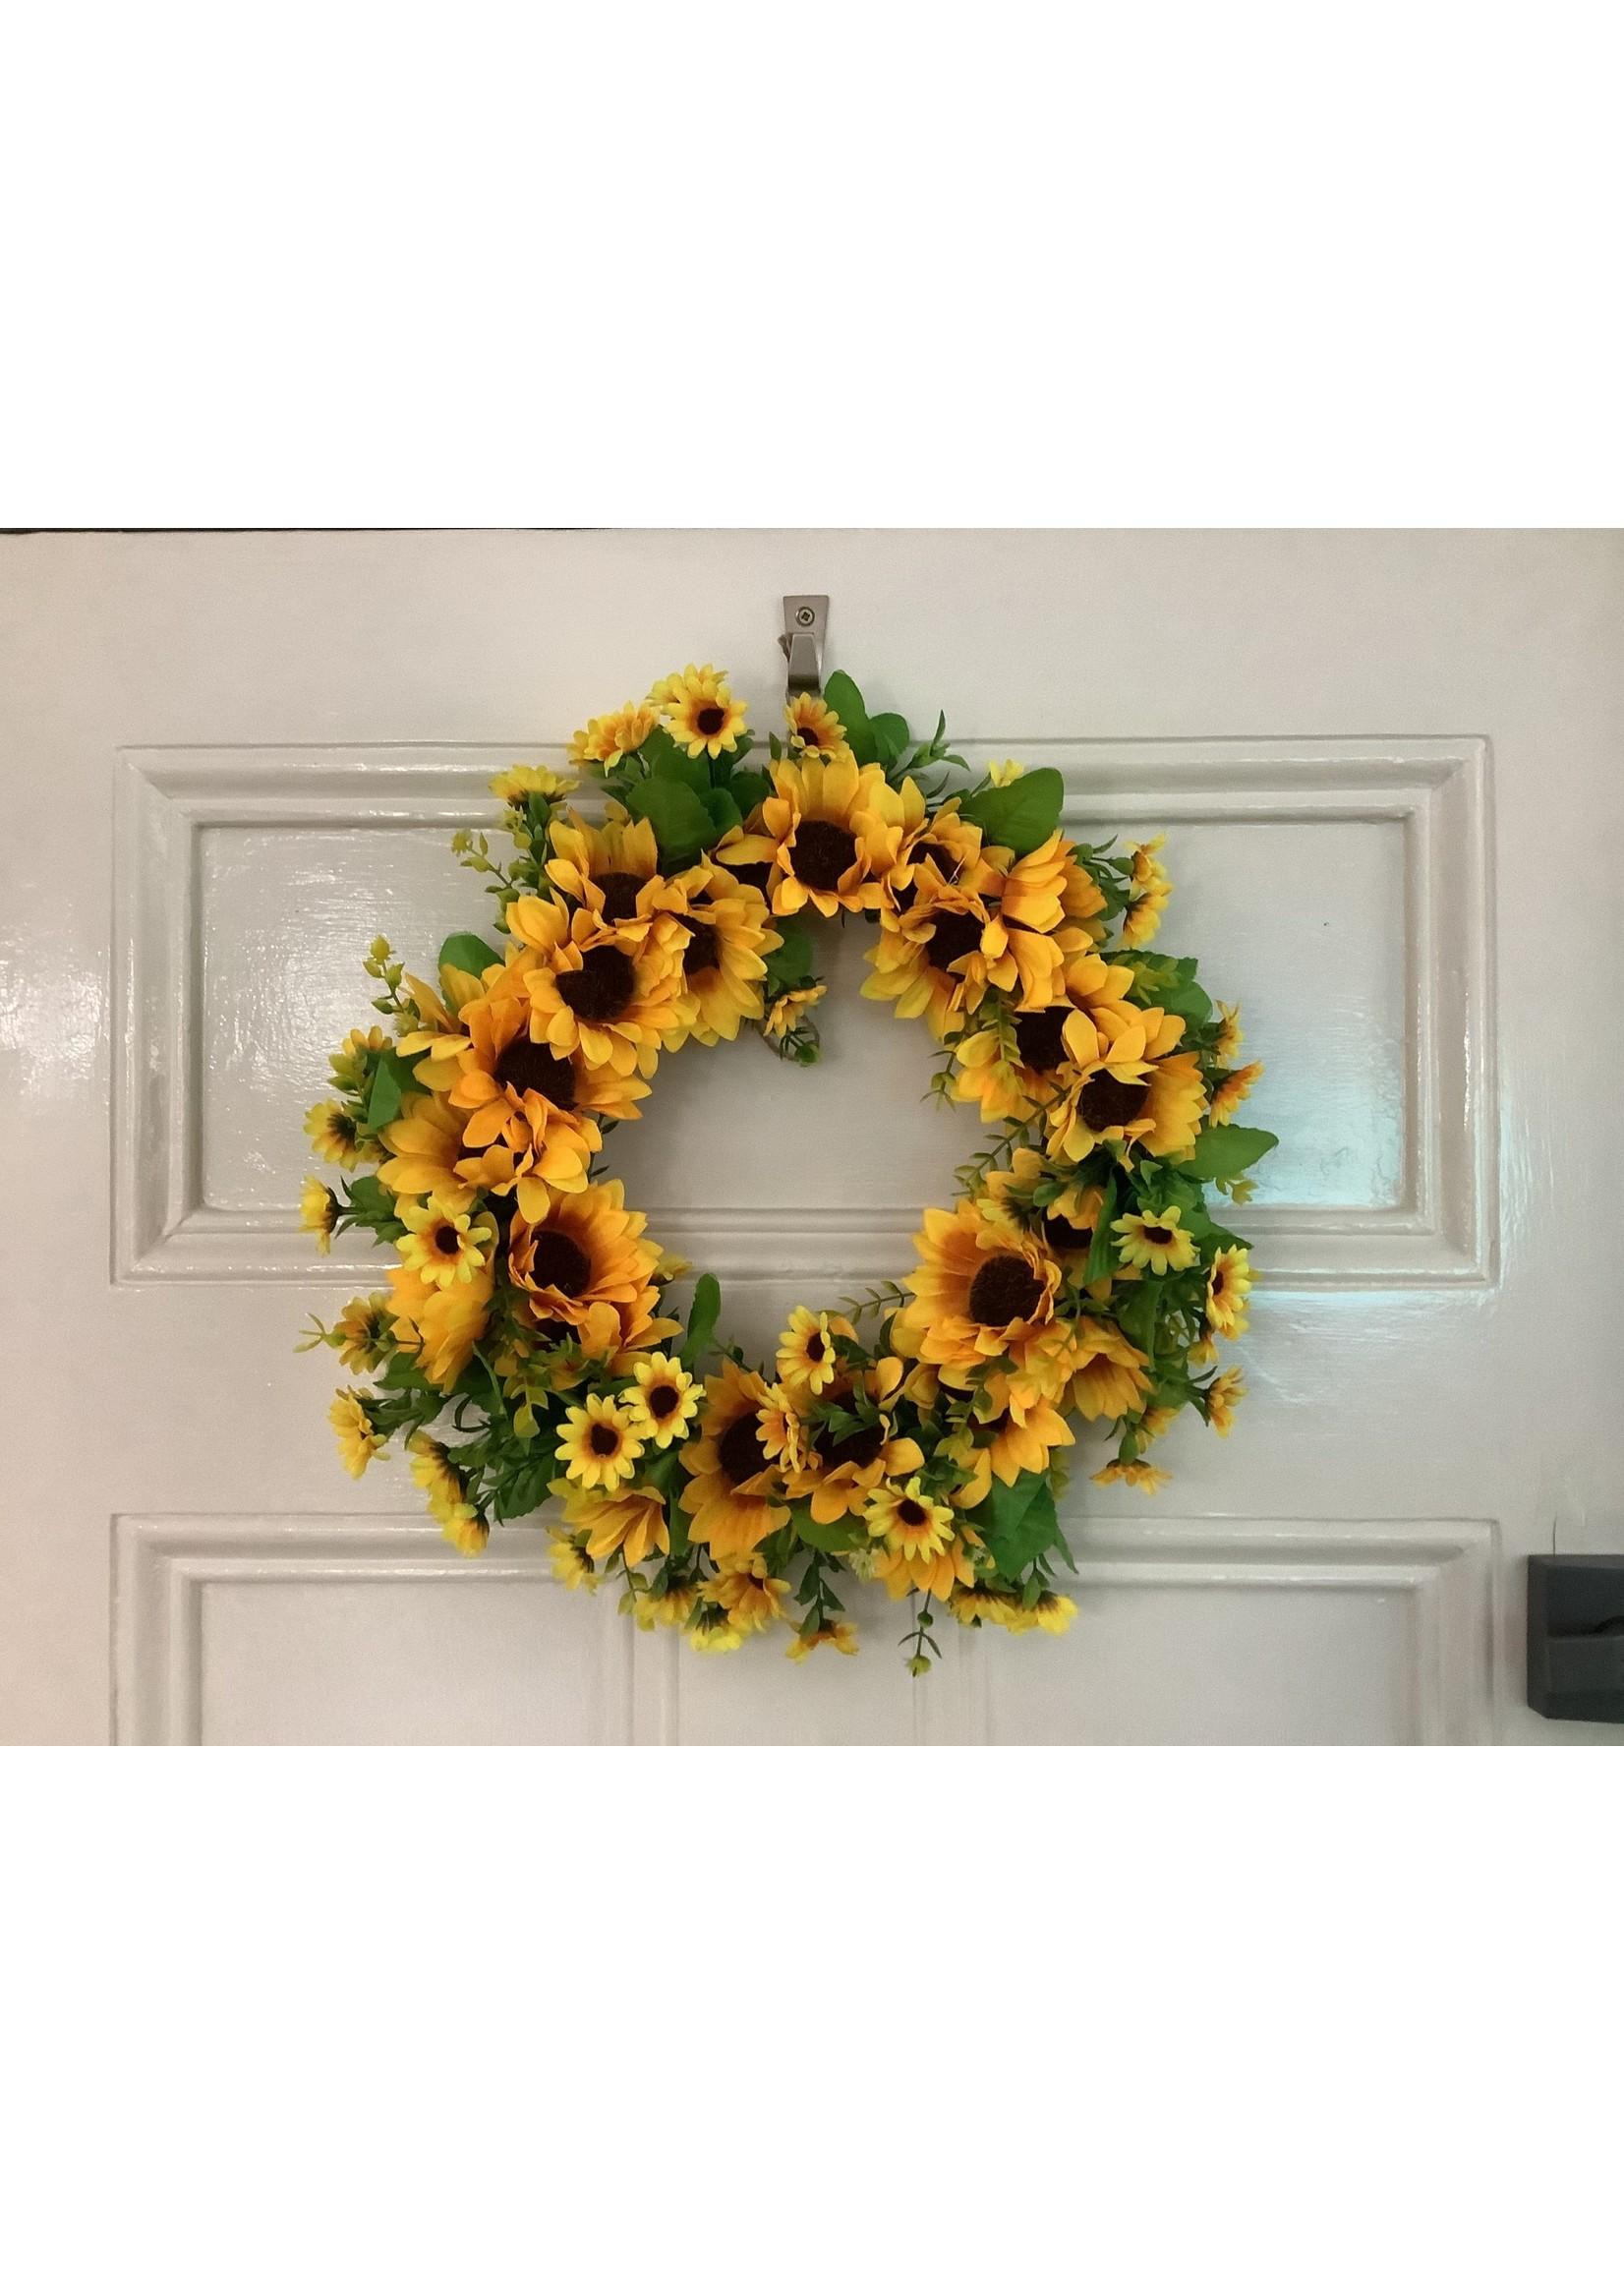 Sunflower wreath 40cm